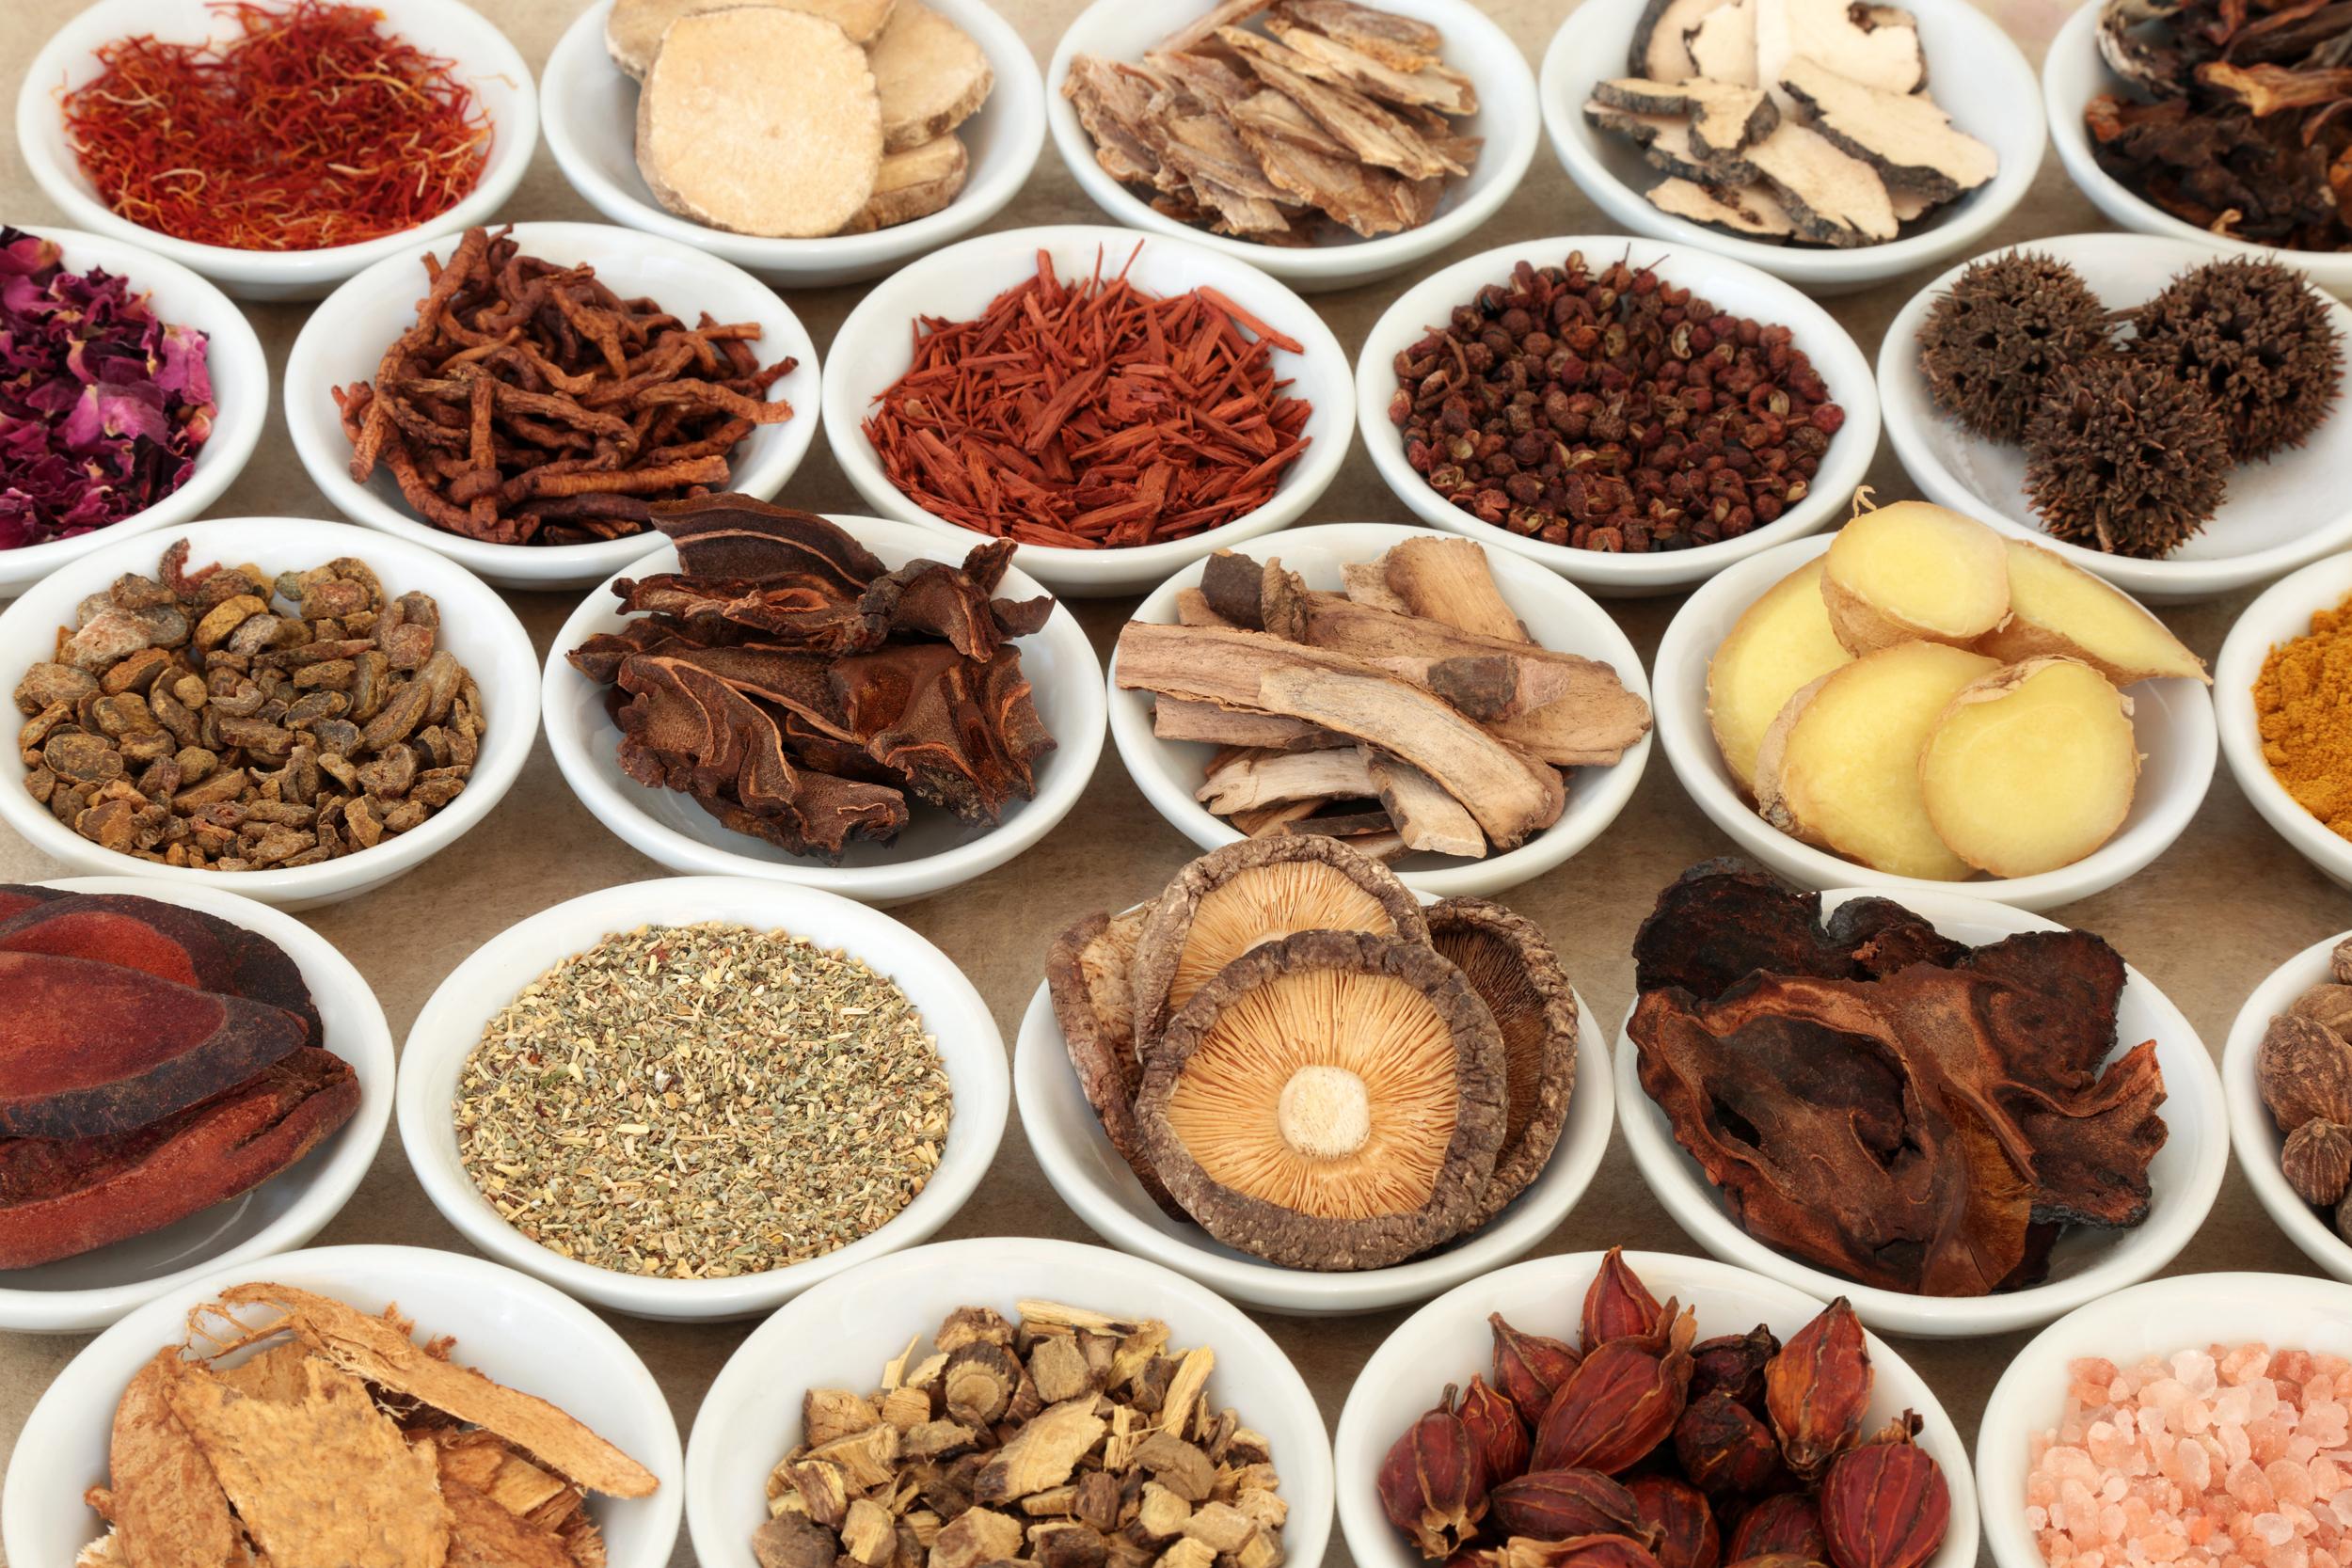 Image: Chinese herbal medicine